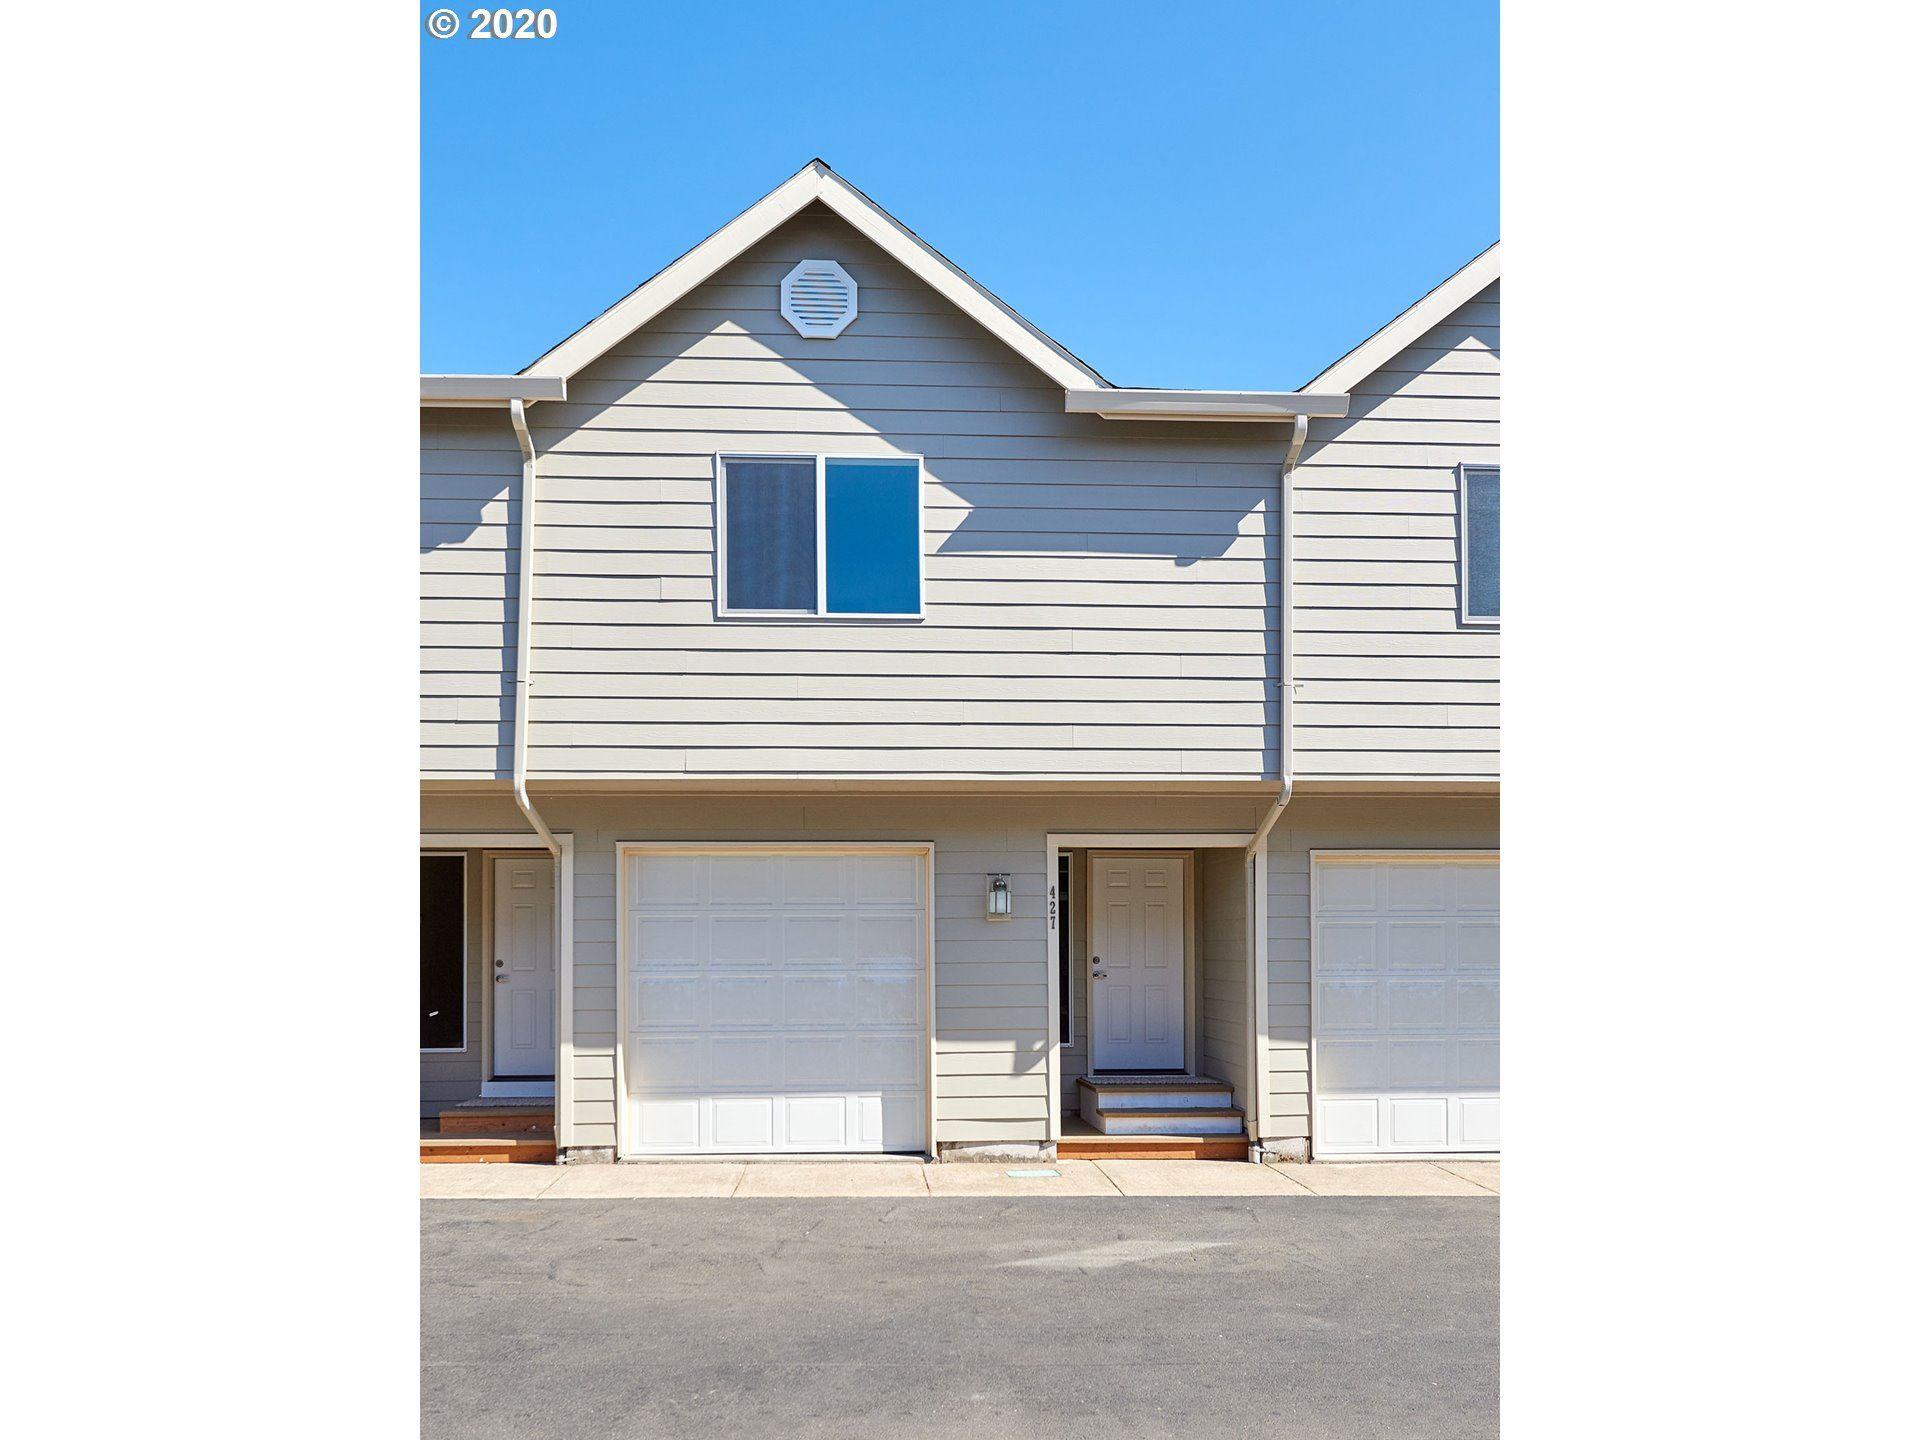 427 Harris LN, Oregon City, OR 97045 - MLS#: 20535270